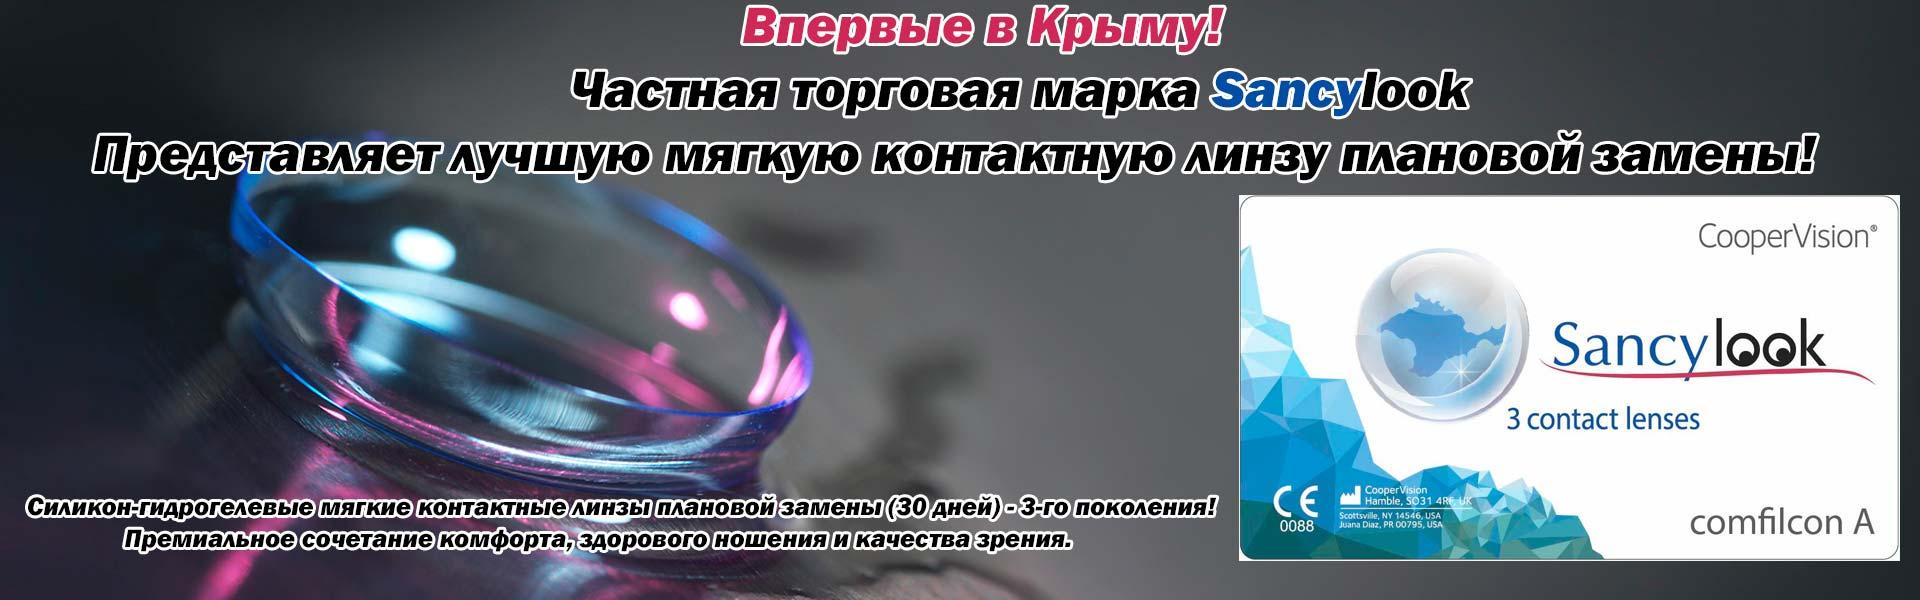 Sancylook МЦ ОПТИКА